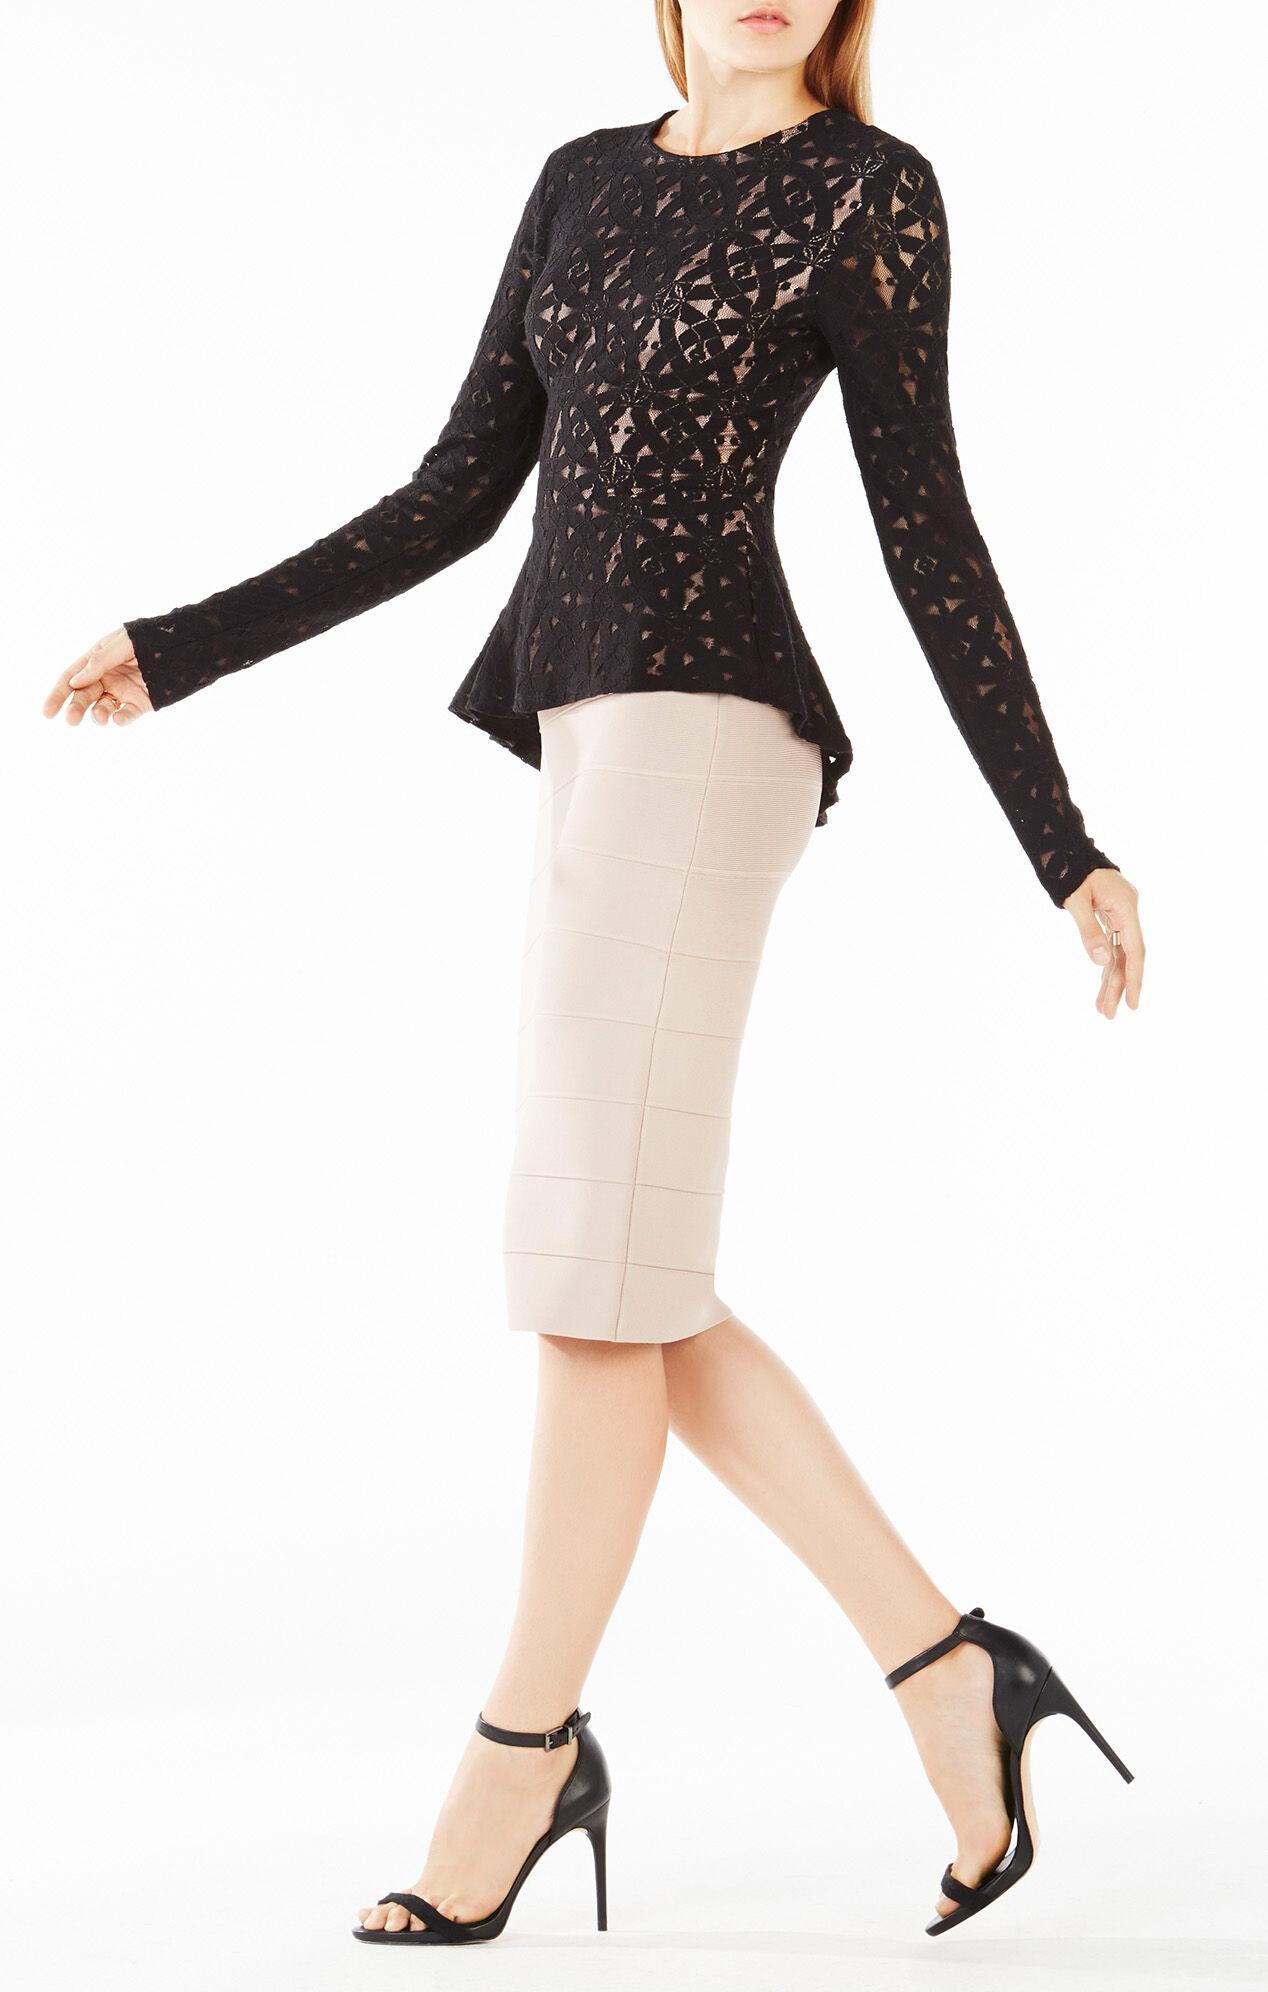 Estelle Long-Sleeve Lace Peplum Top